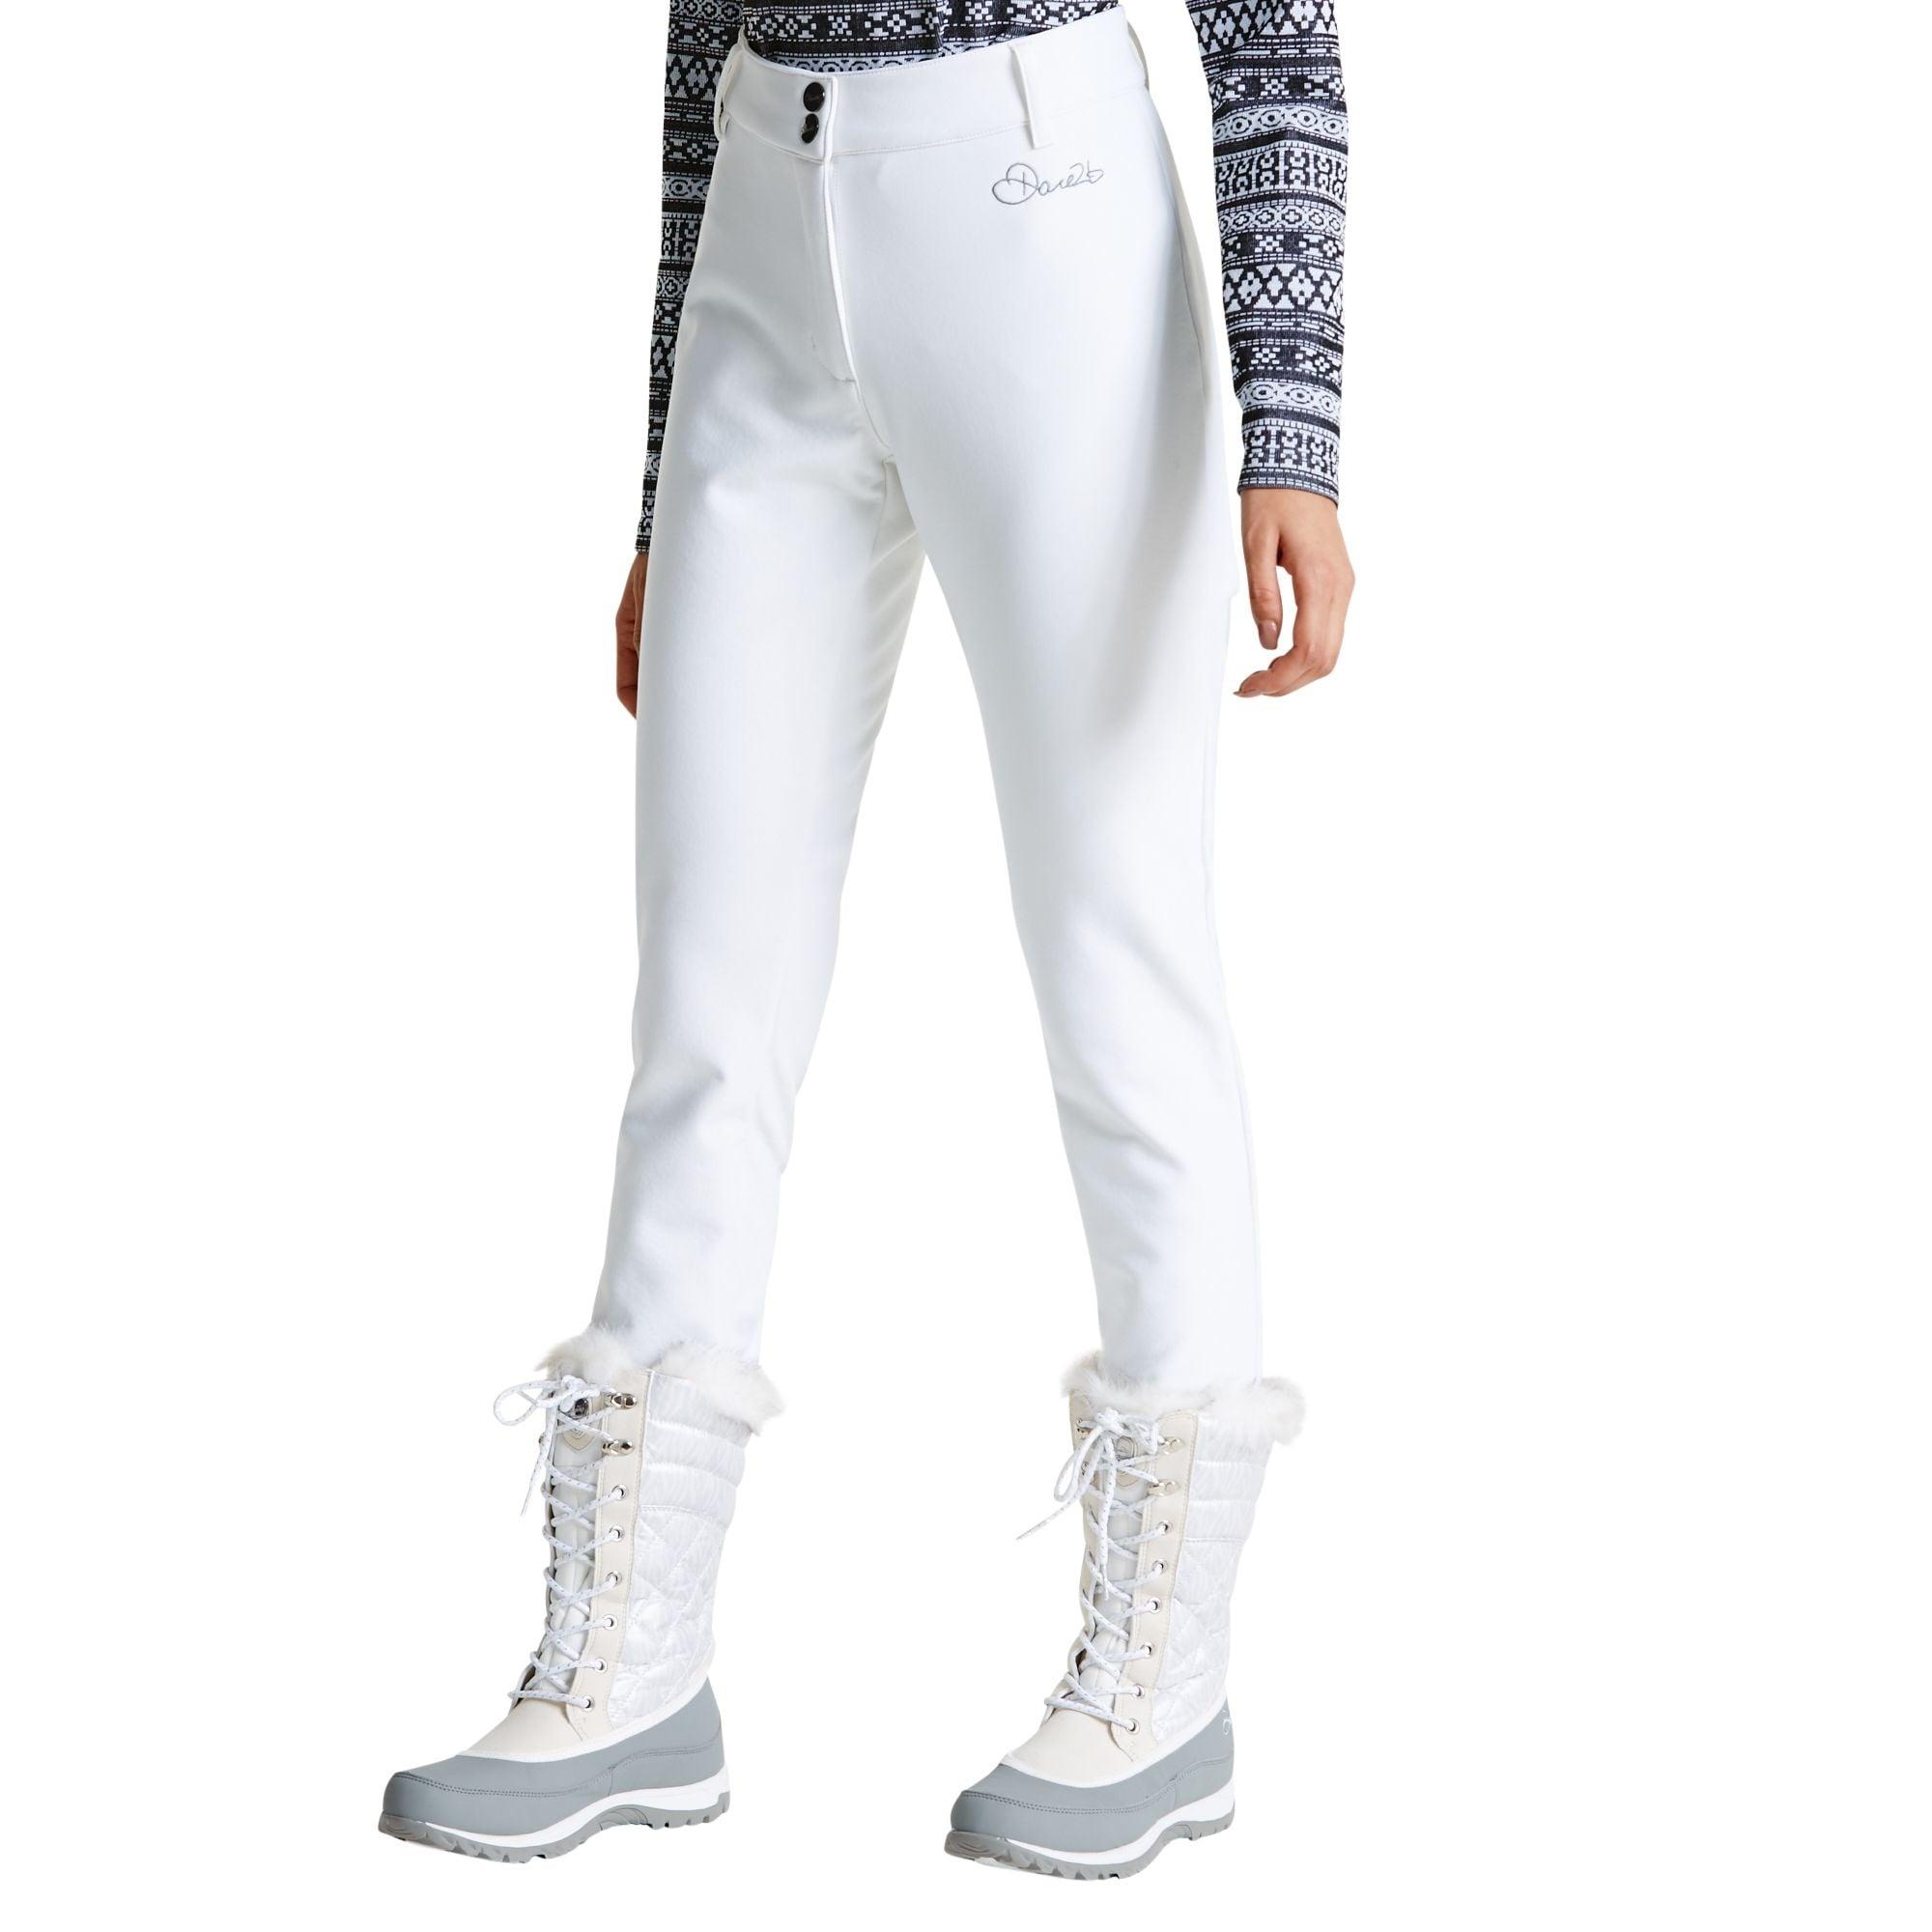 Dare2b-Shapely-Women-039-s-Windproof-Waterproof-Breathable-Ski-Trouser thumbnail 5